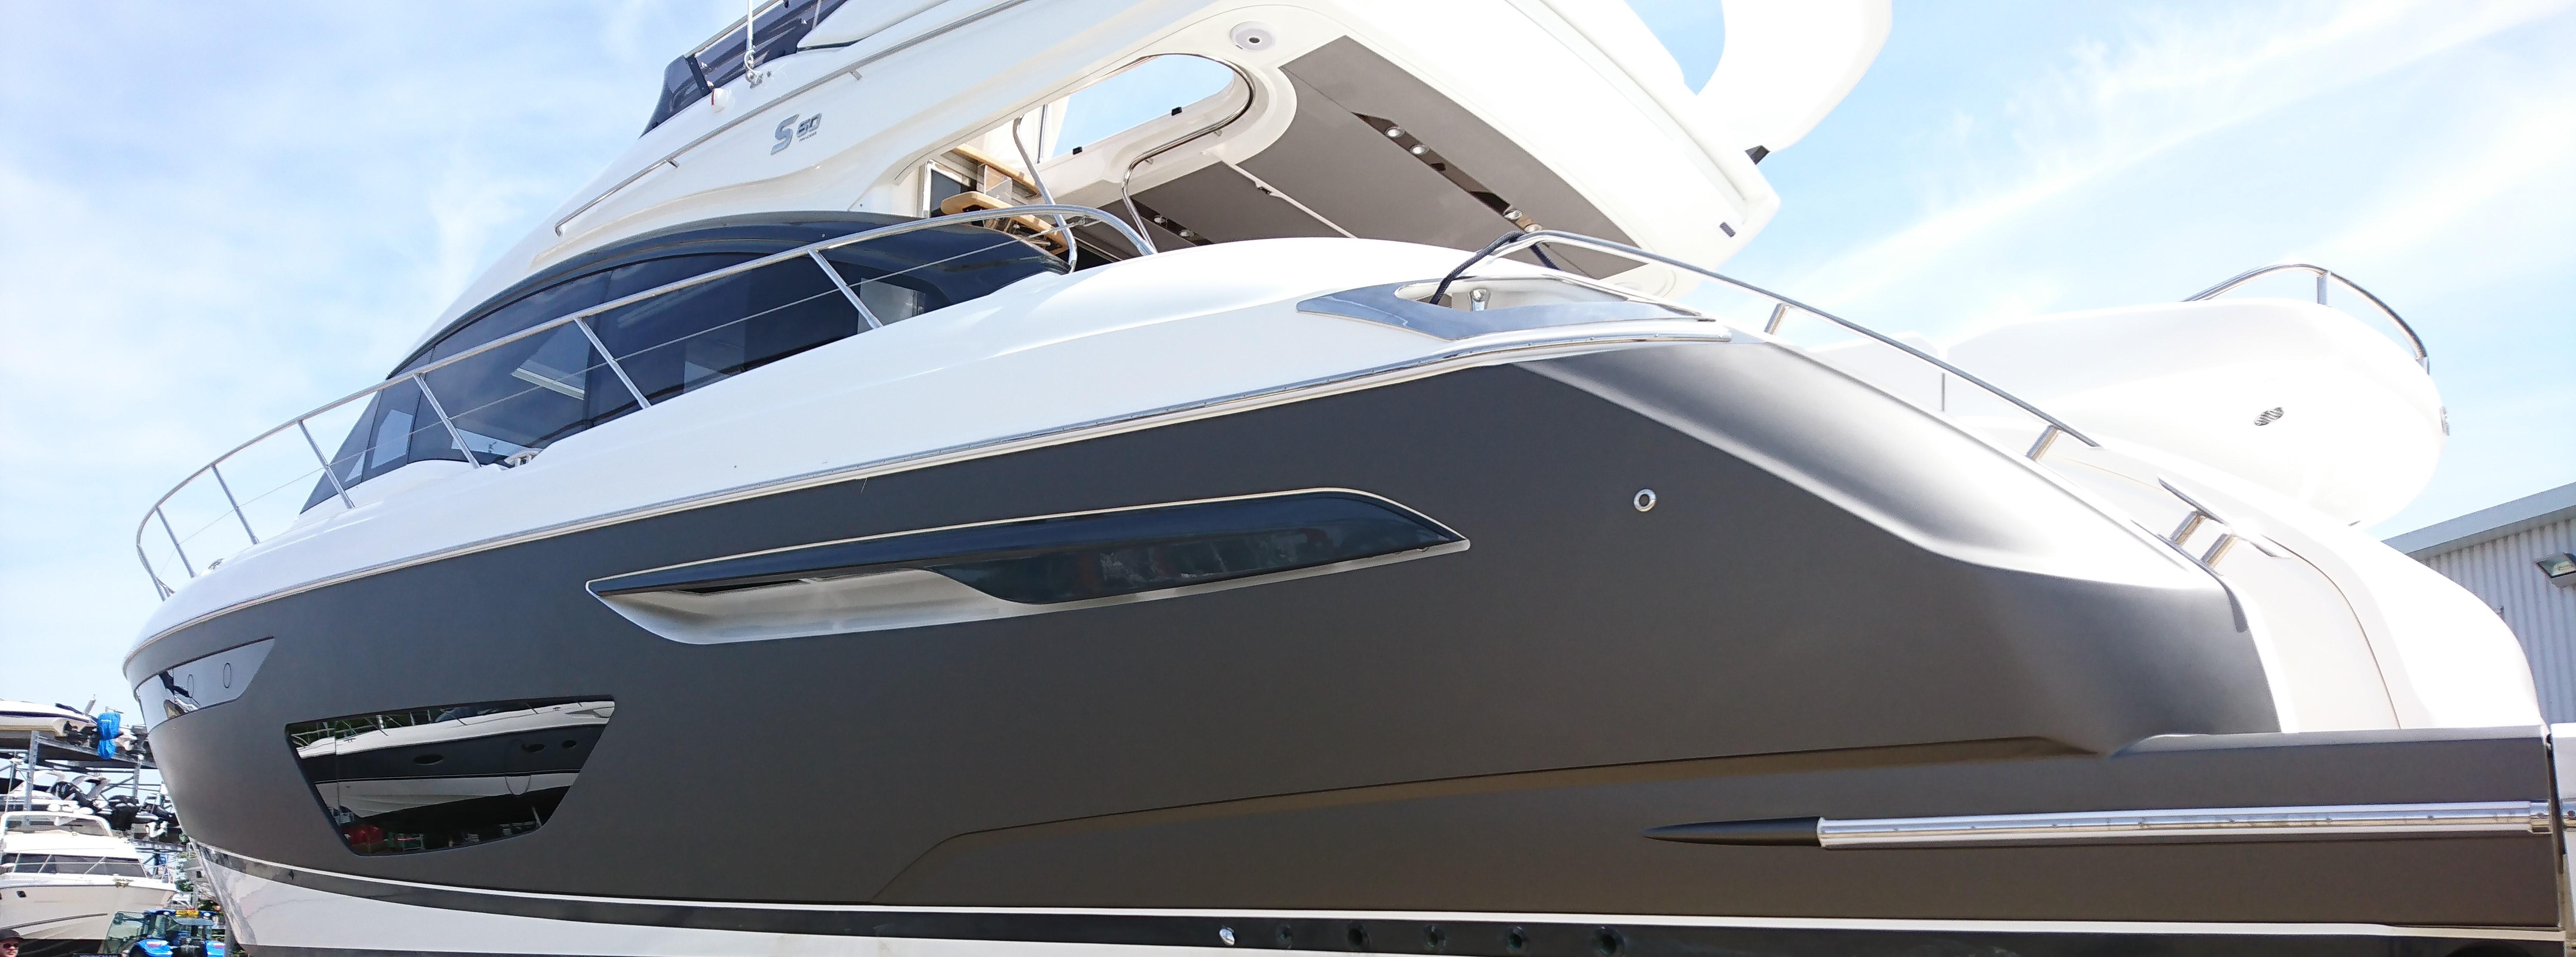 yacht with vinyl wrap